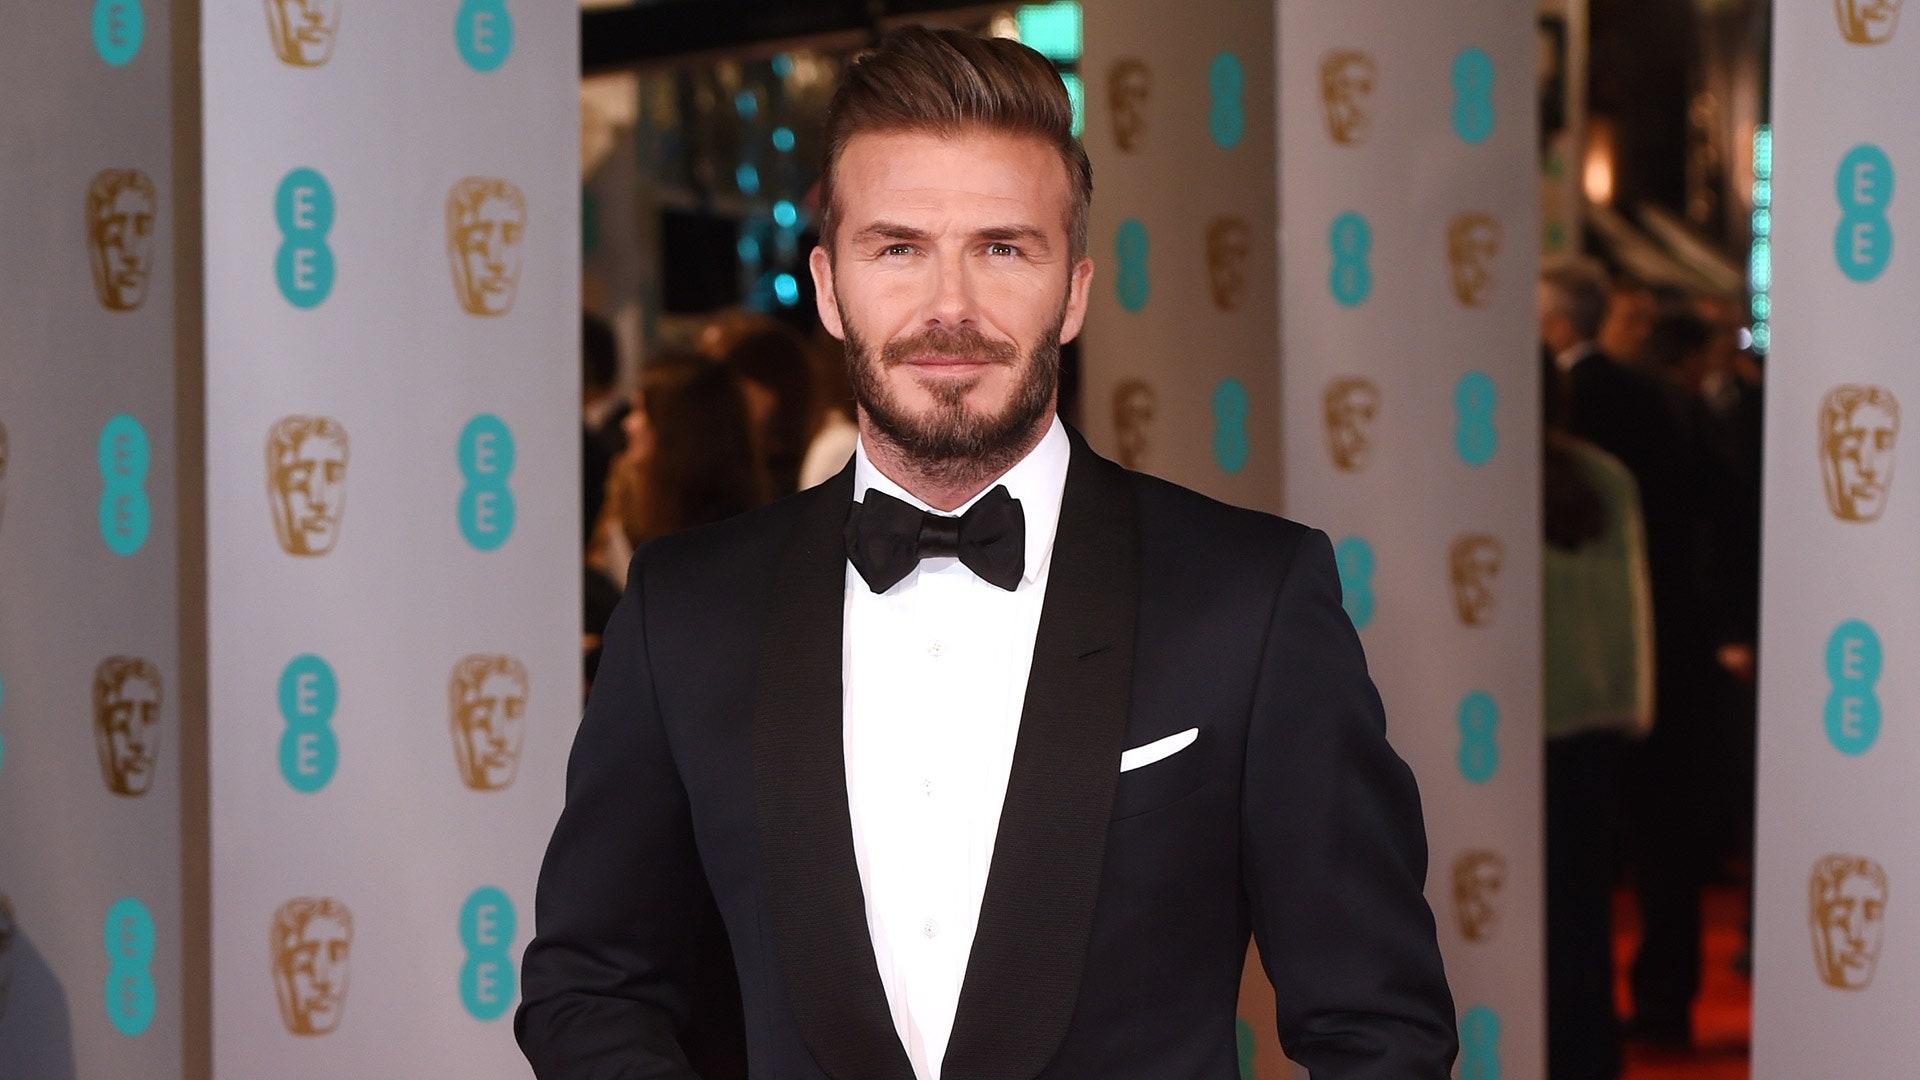 celebrity david beckham in tuxedo hair transplant